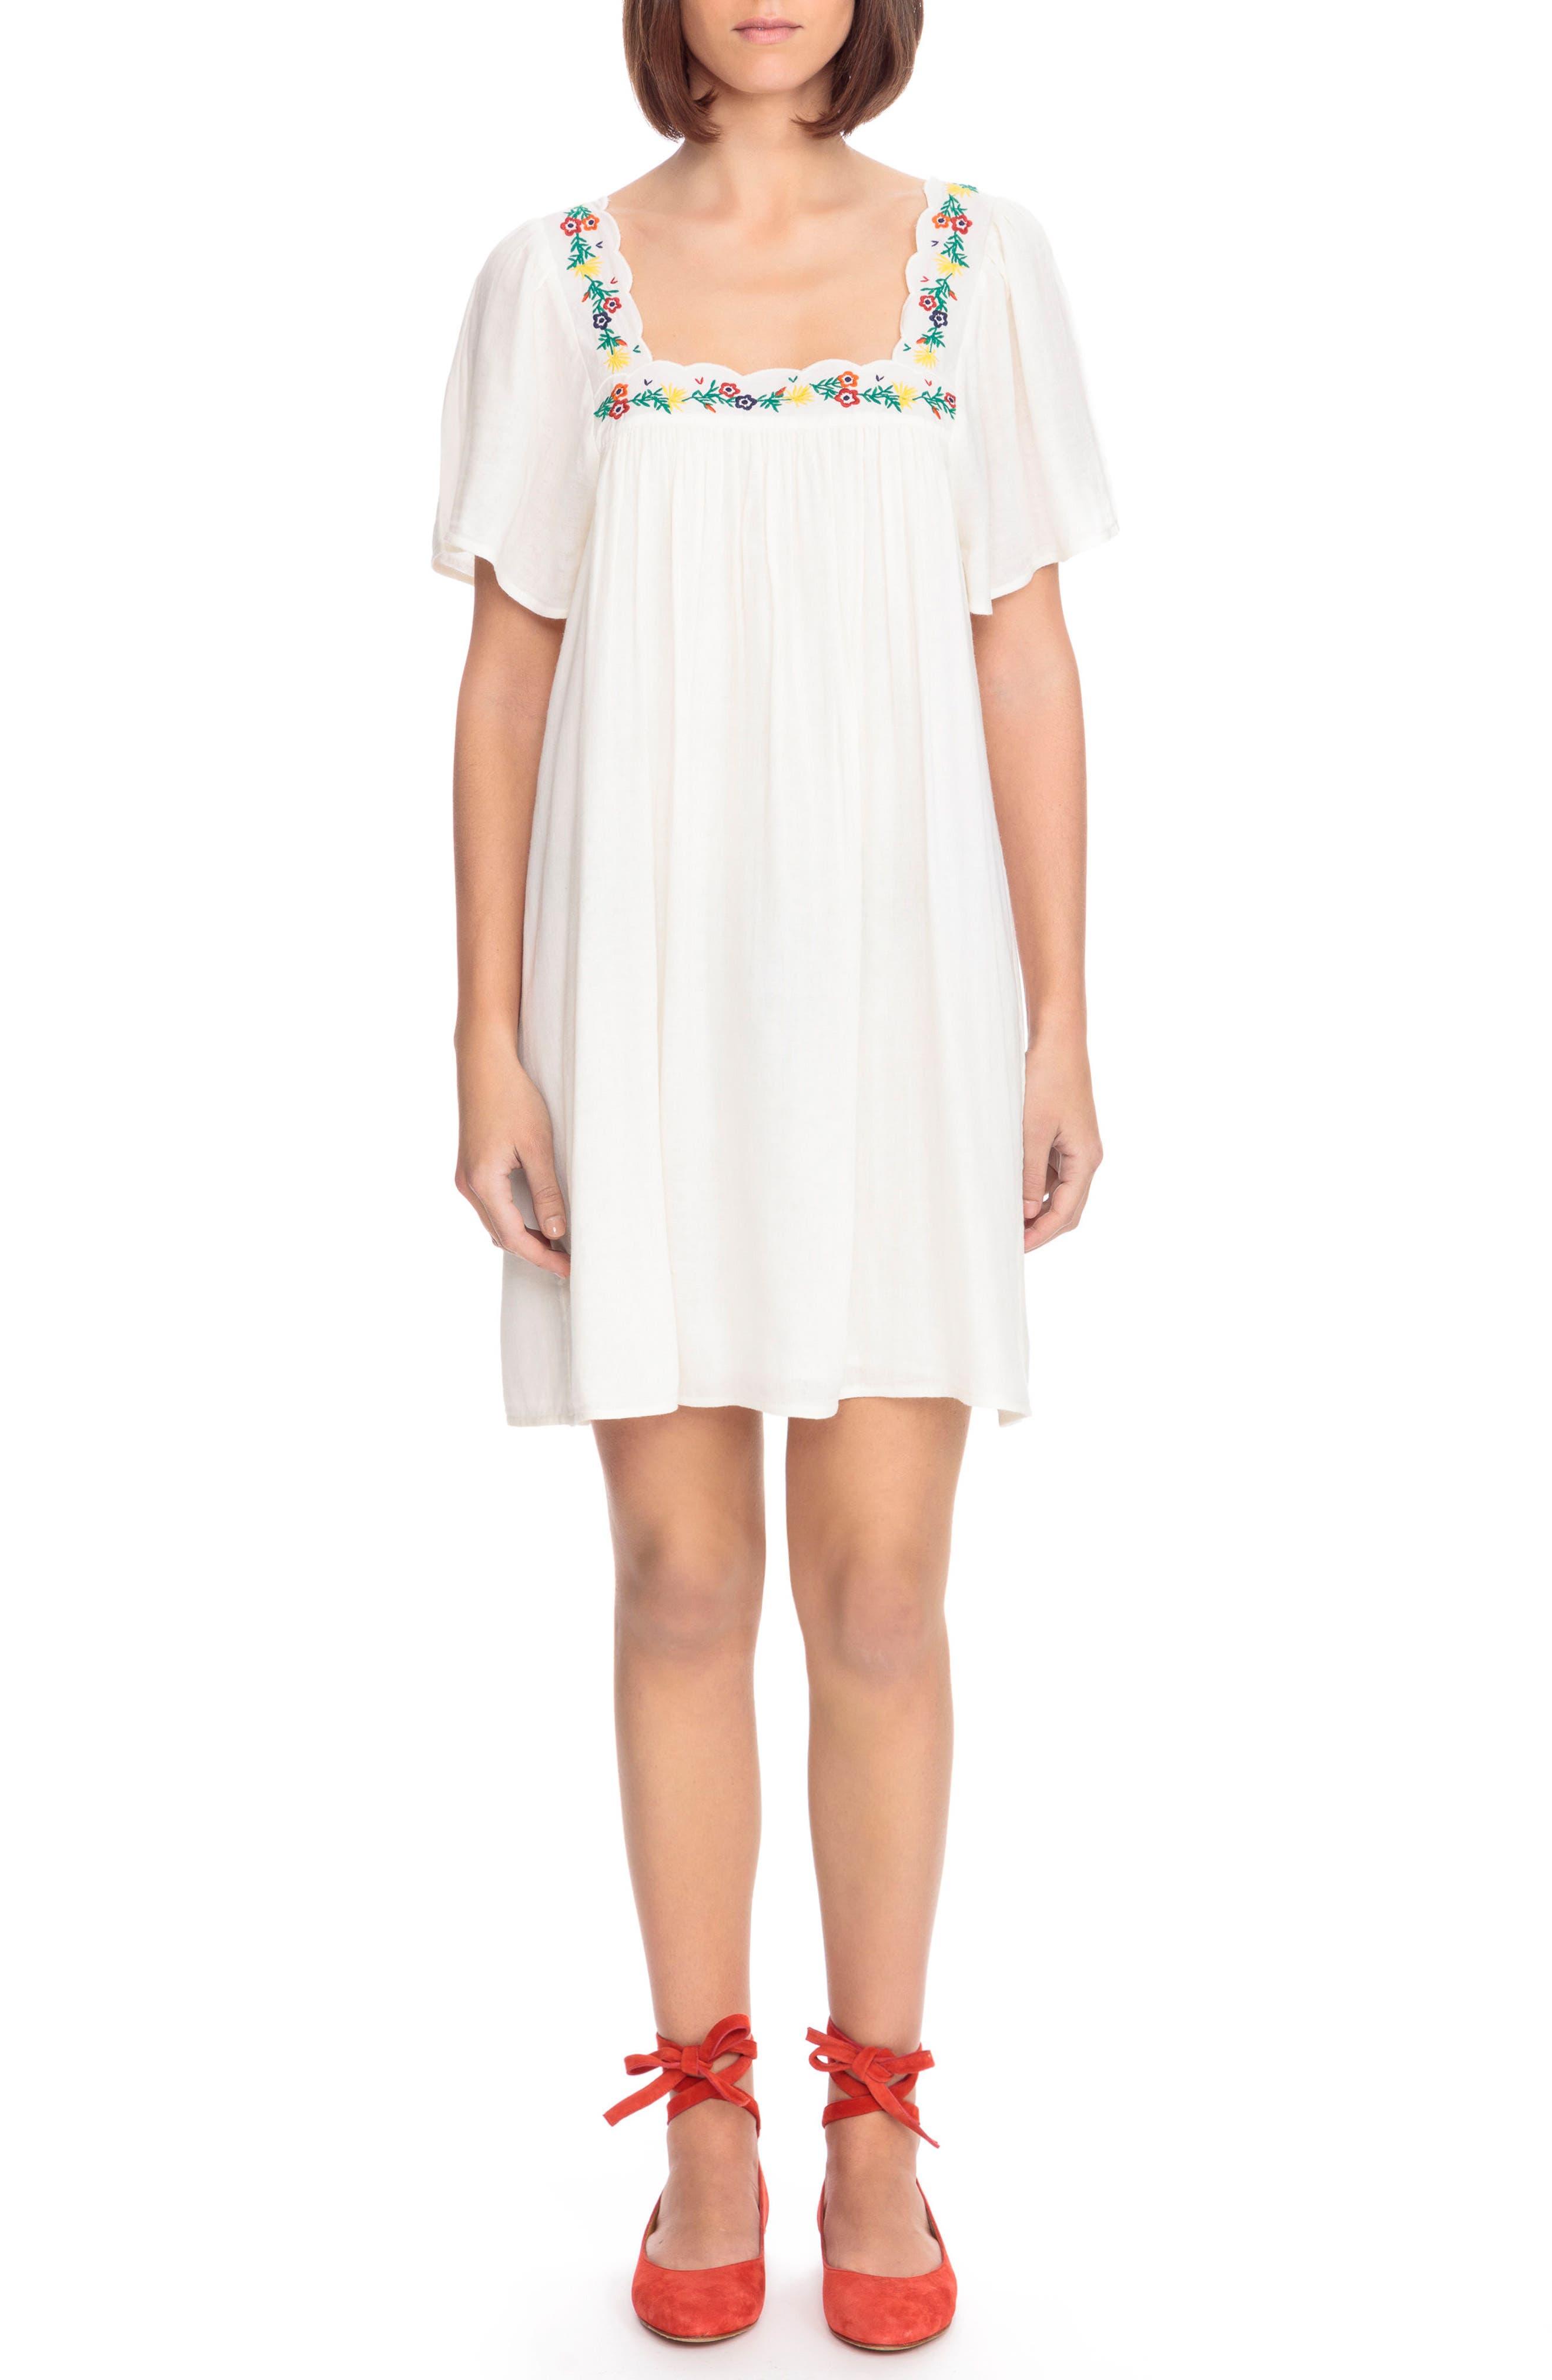 Alternate Image 1 Selected - Sézane Caitlin Embroidered Shift Dress